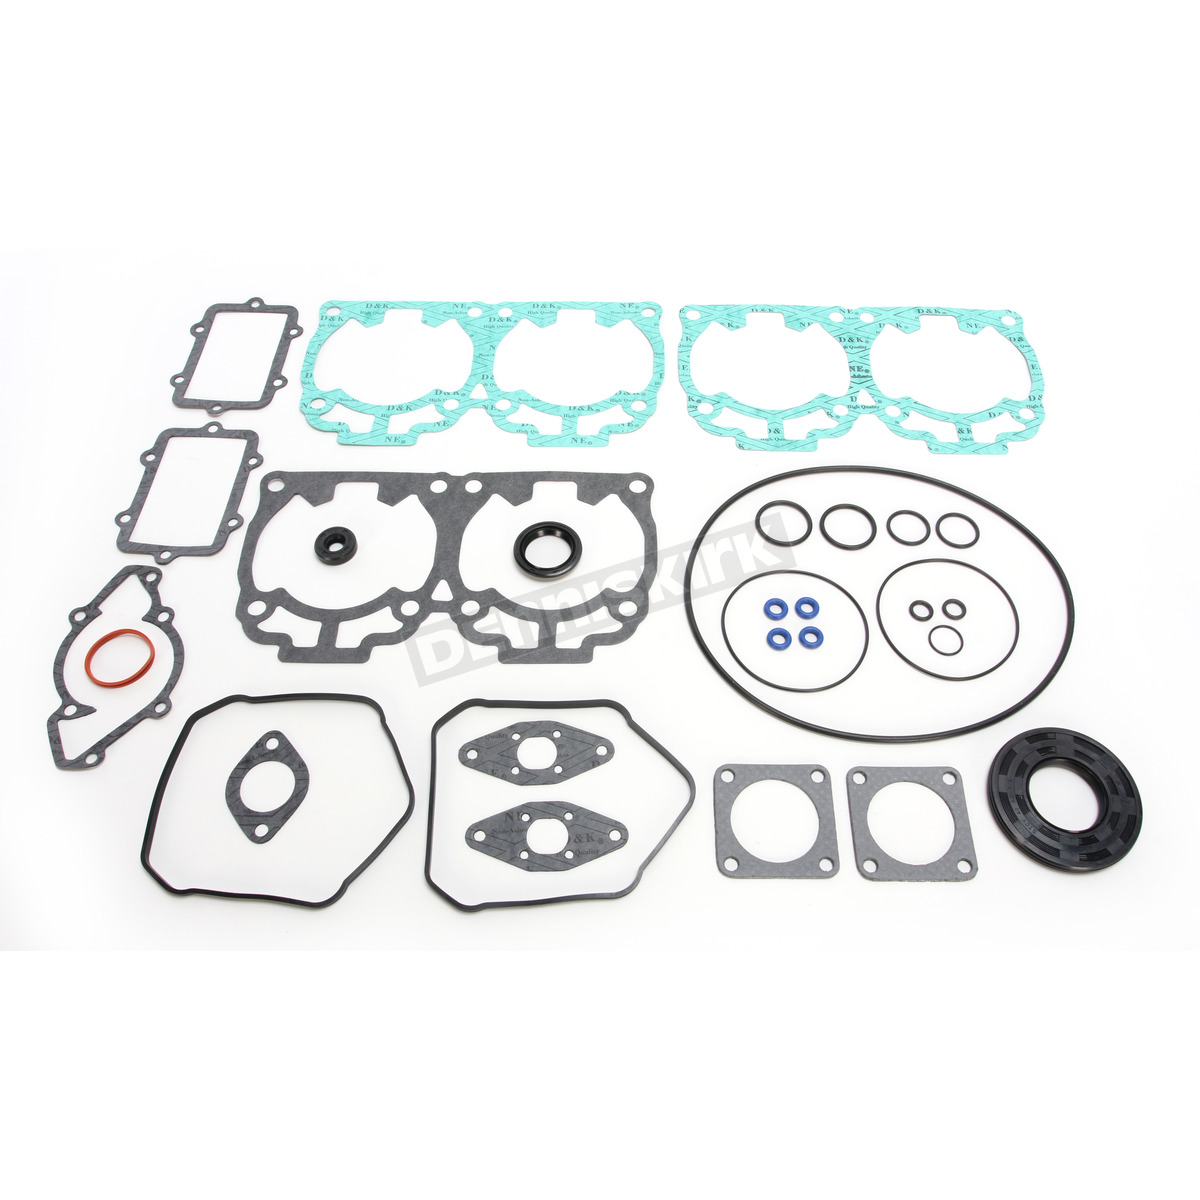 Sports Parts Inc Full Engine Gasket Kit